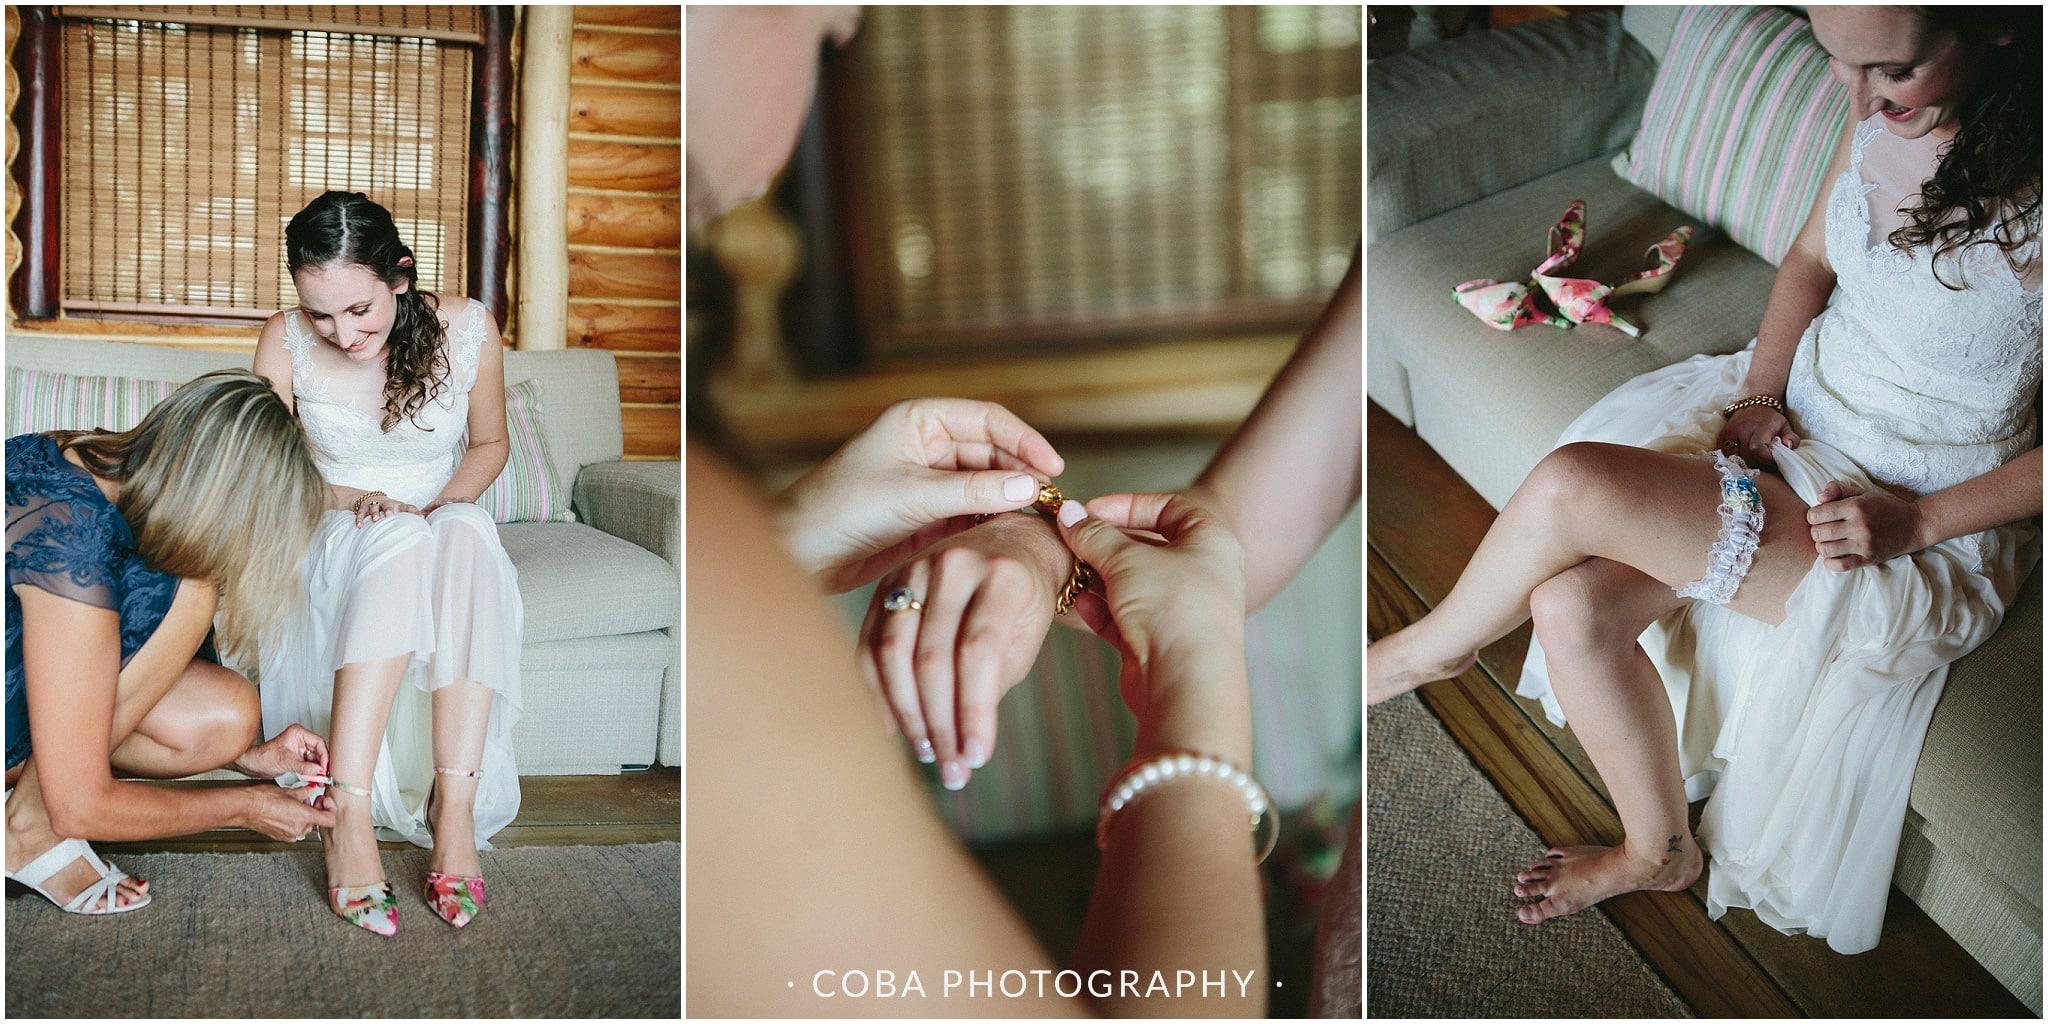 John&Pad - Olive Rock - Coba Photography (45)